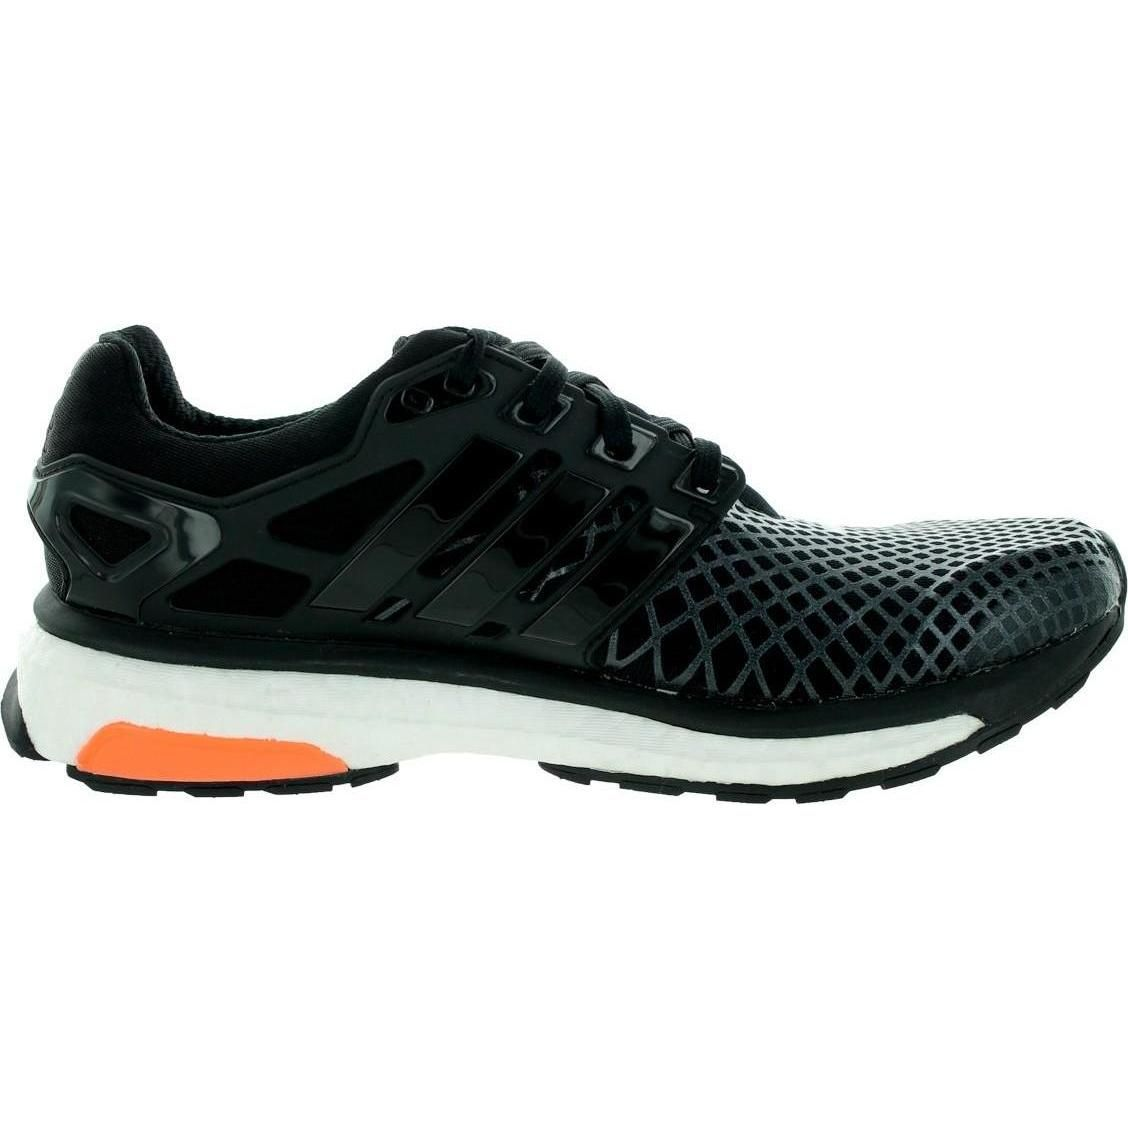 low cost fad83 ebdac Khloe Kardashian wearing Adidas Energy Boost 2 Atr Running Shoes